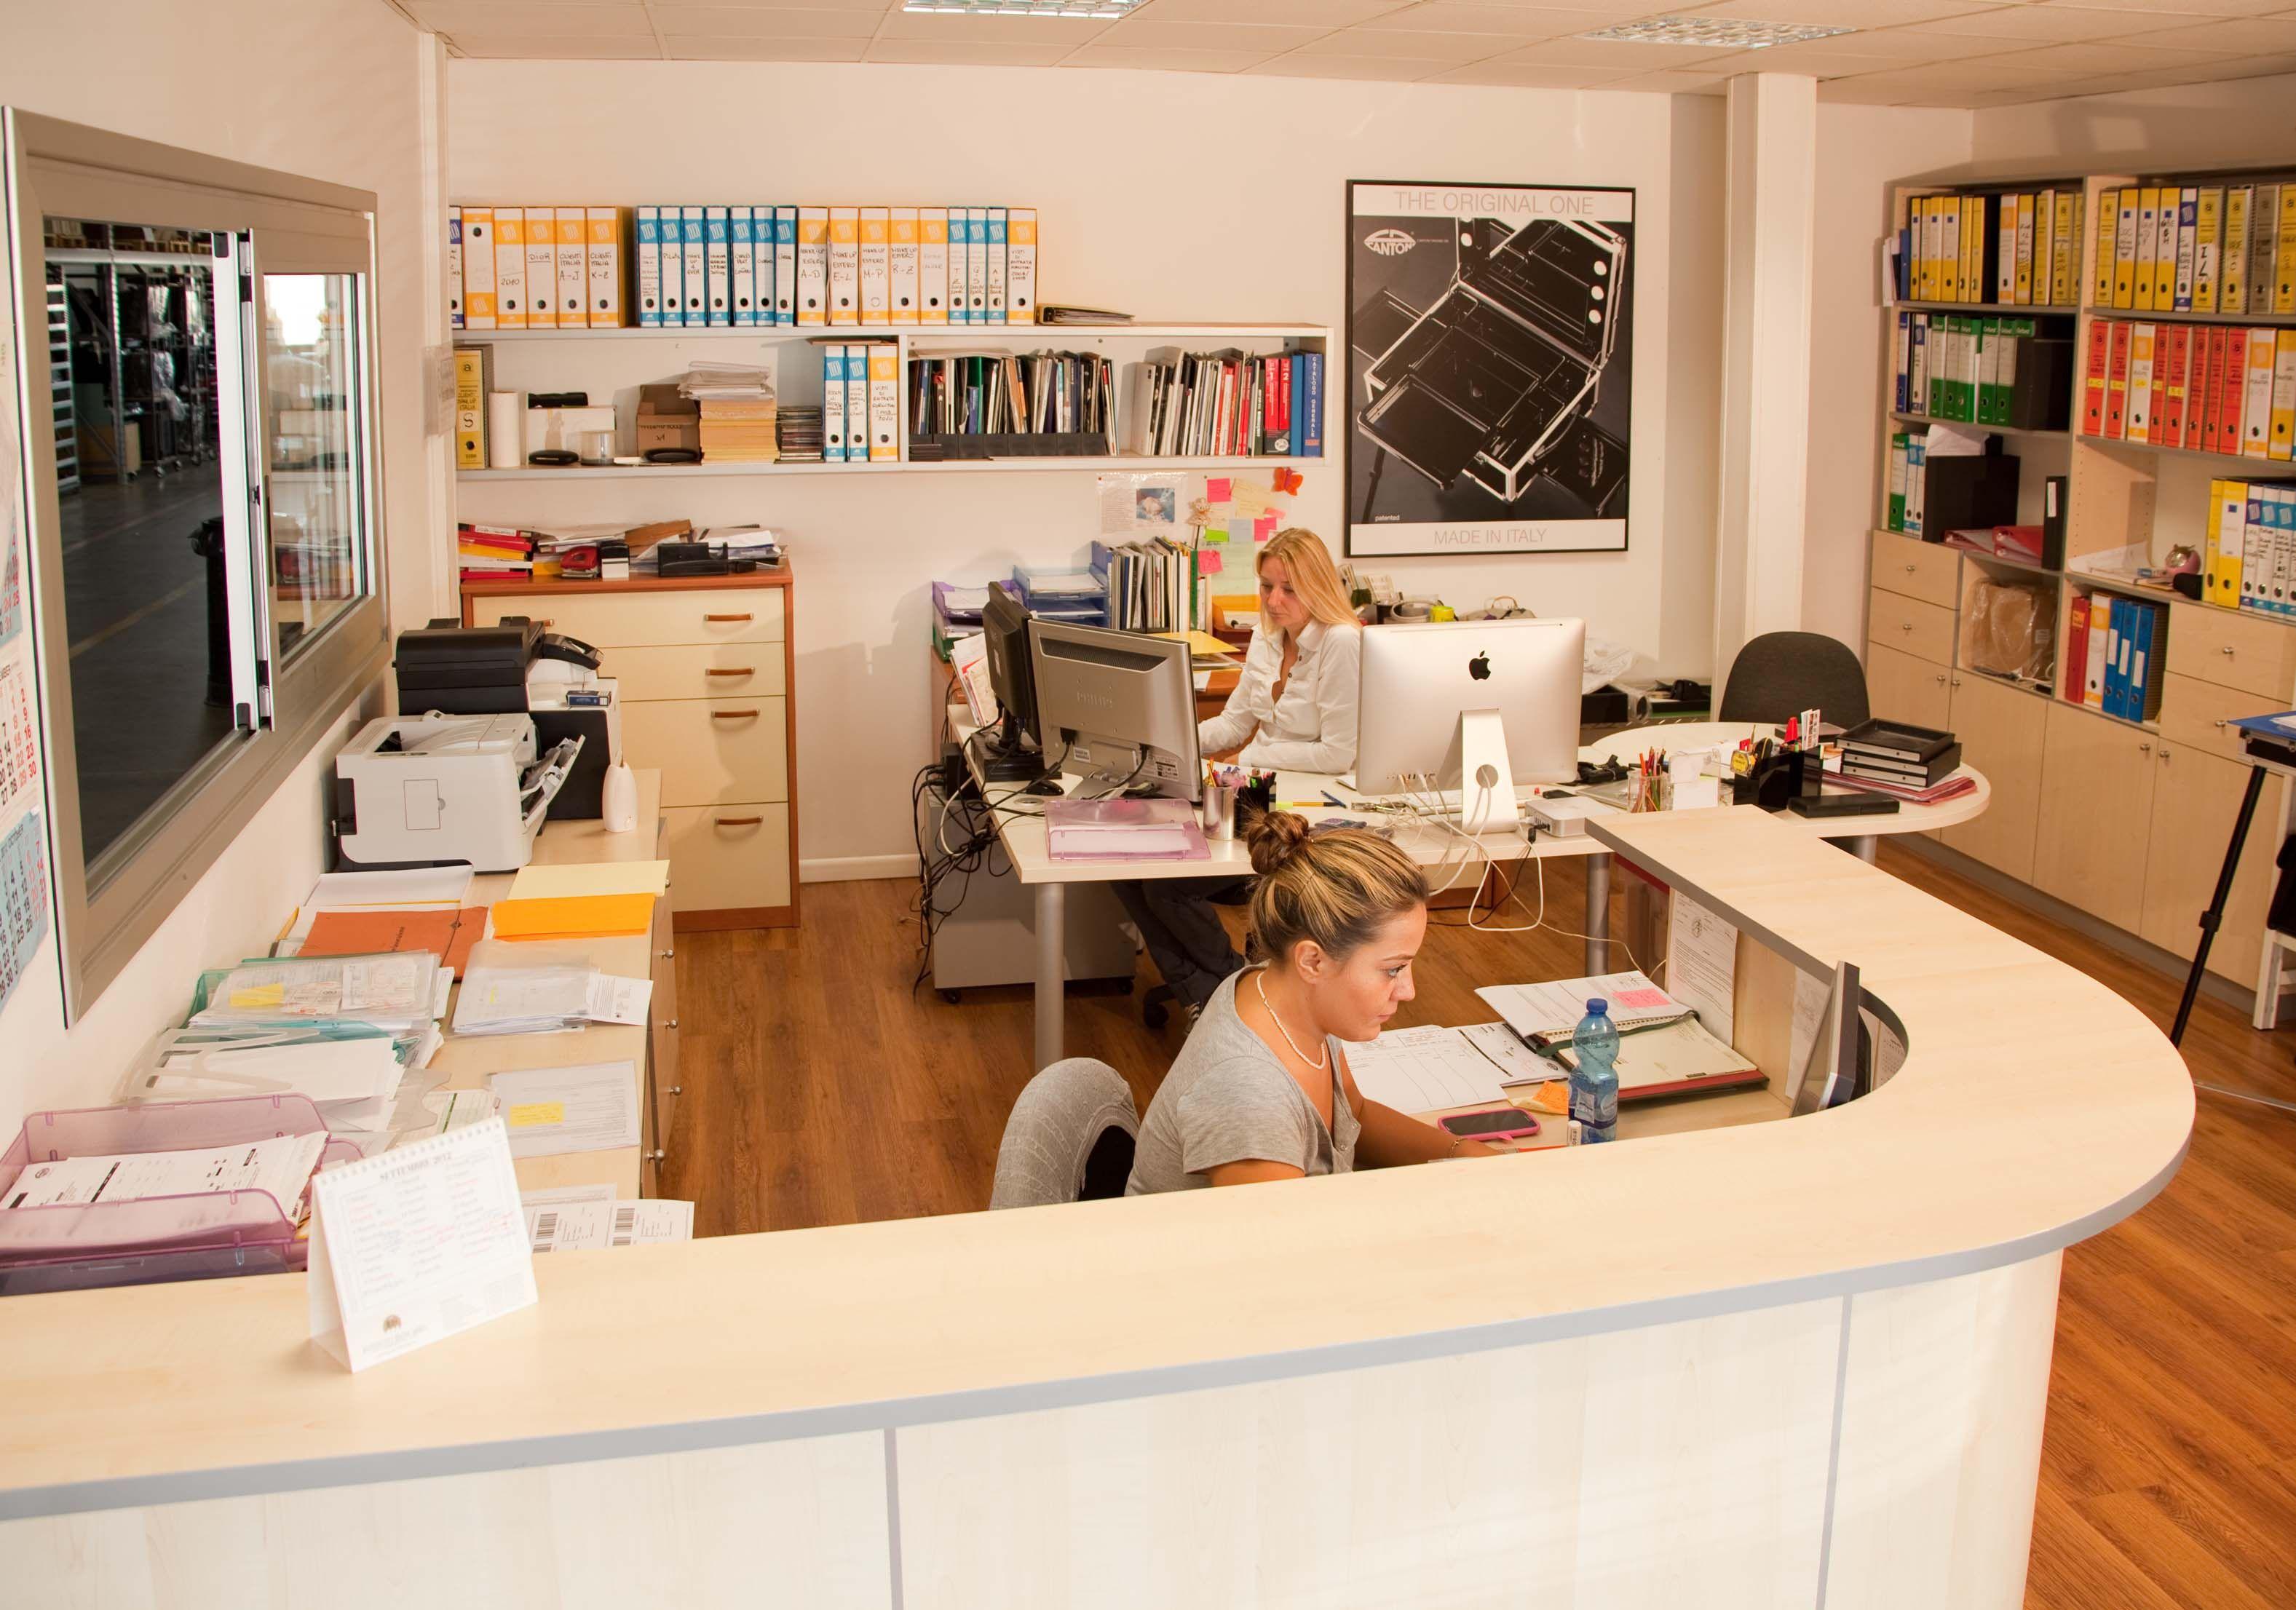 Administrative @Cantoni Make Up Stations Make Up Stations Office. #makeupstation #cantonioffice #cantoniadministrative